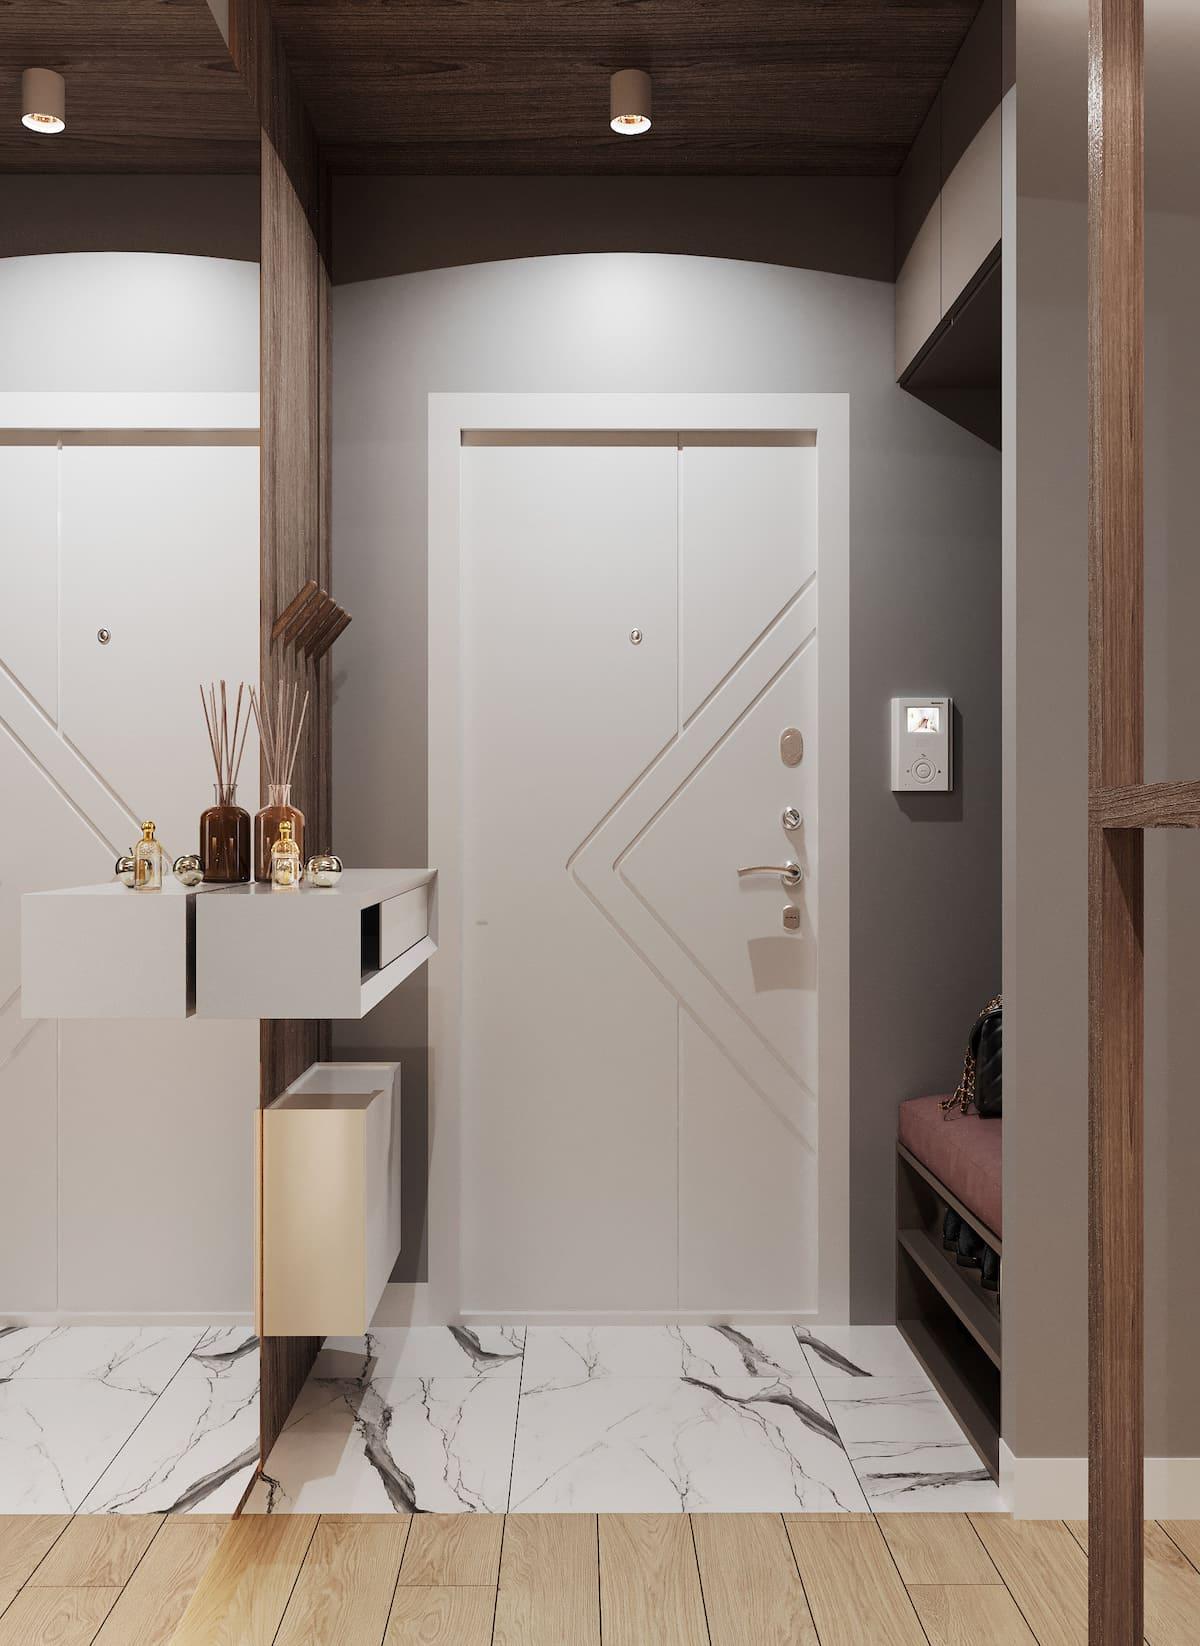 дизайн интерьера модной квартиры фото 96